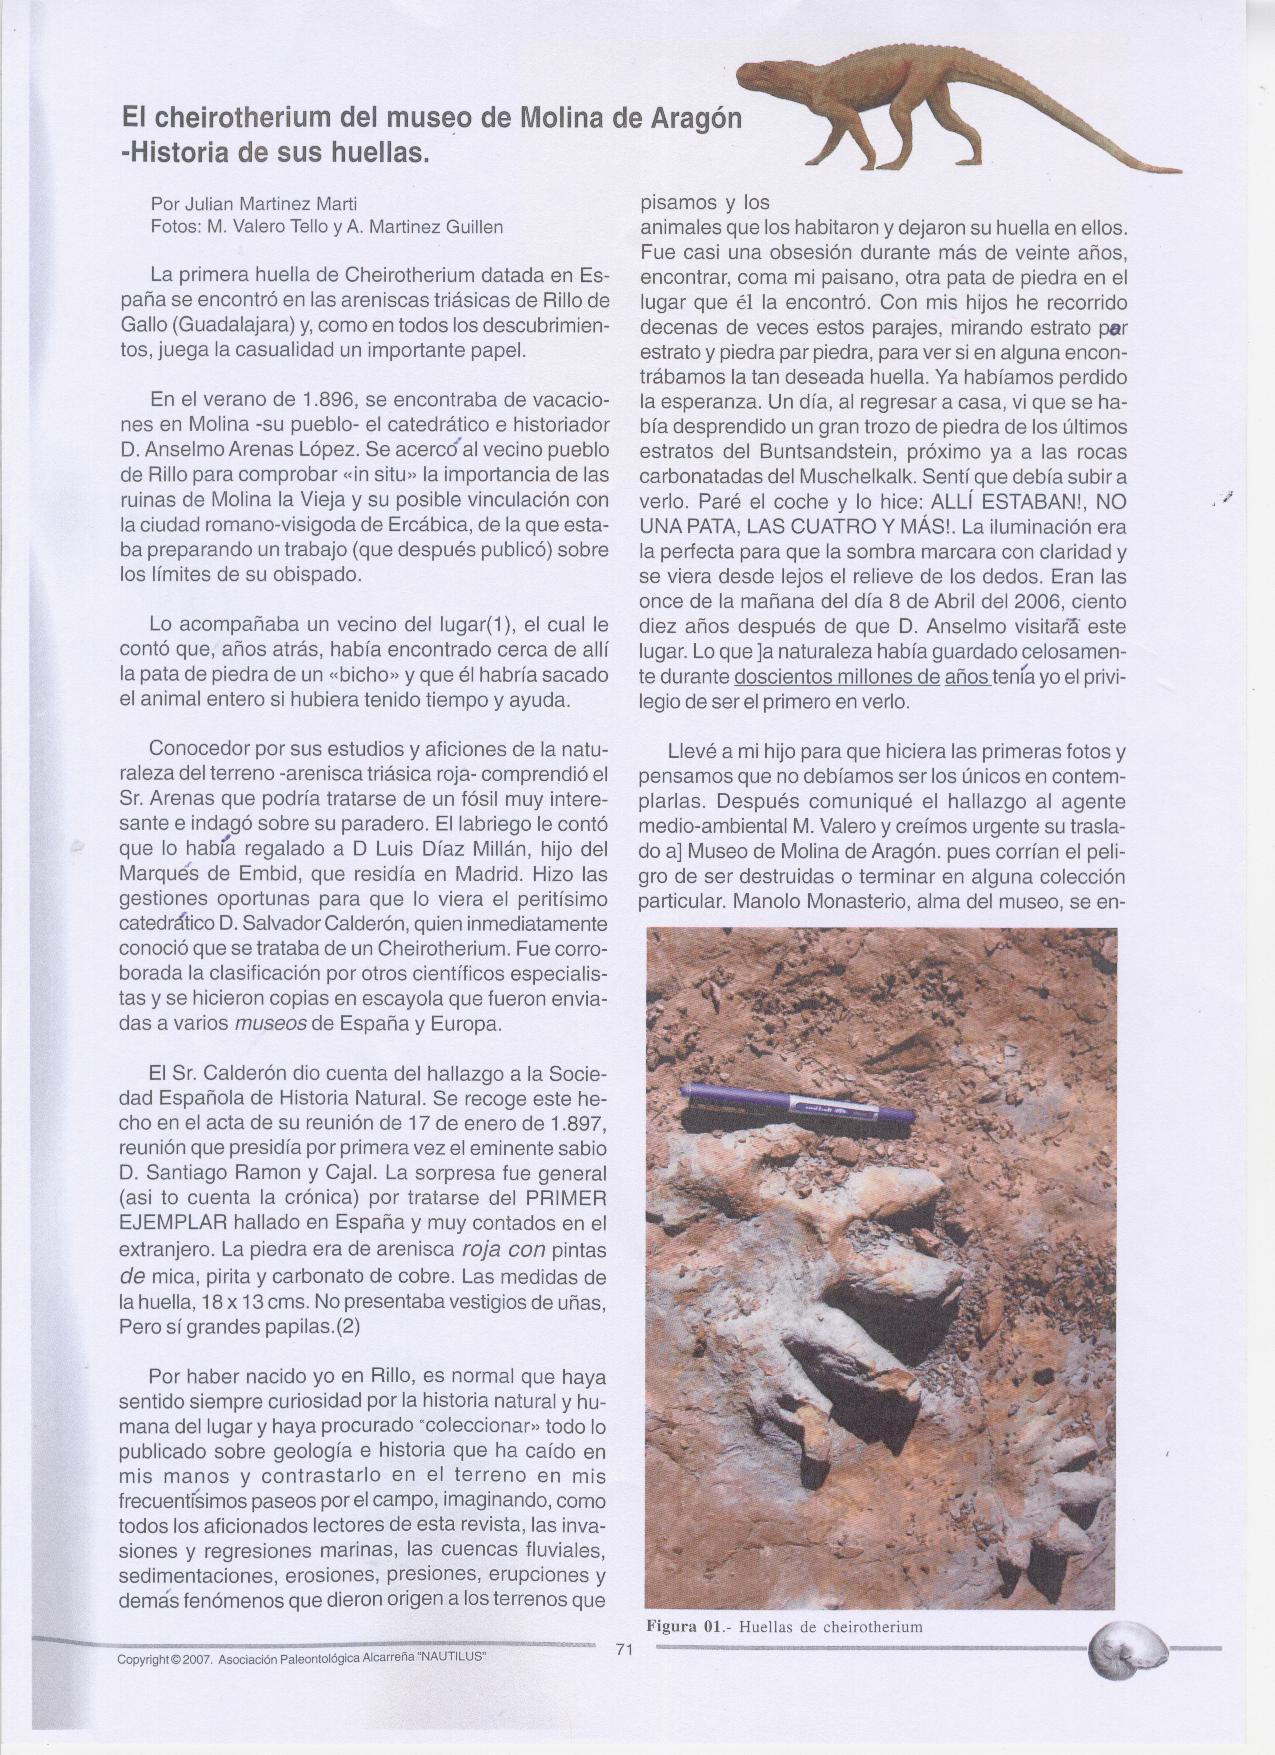 Nautilus. Revista de Divulgación Paleontológica. Diciembre 2007